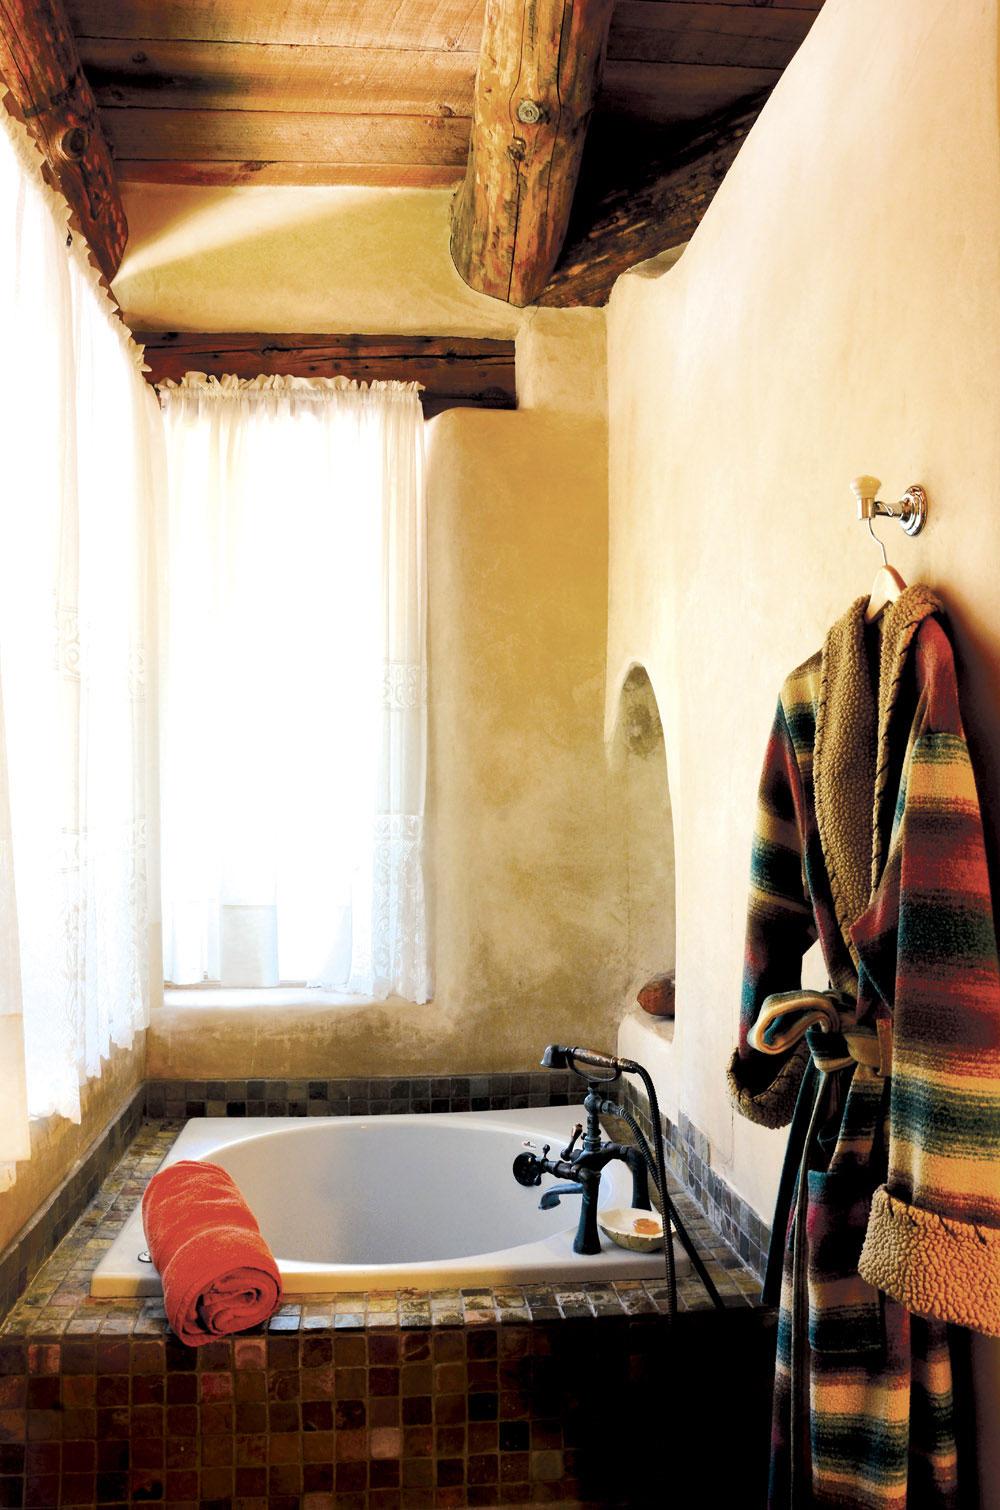 leather sofa bed sleeper kijiji free in brampton suite 7 – the grand canyon el portal sedona hotel